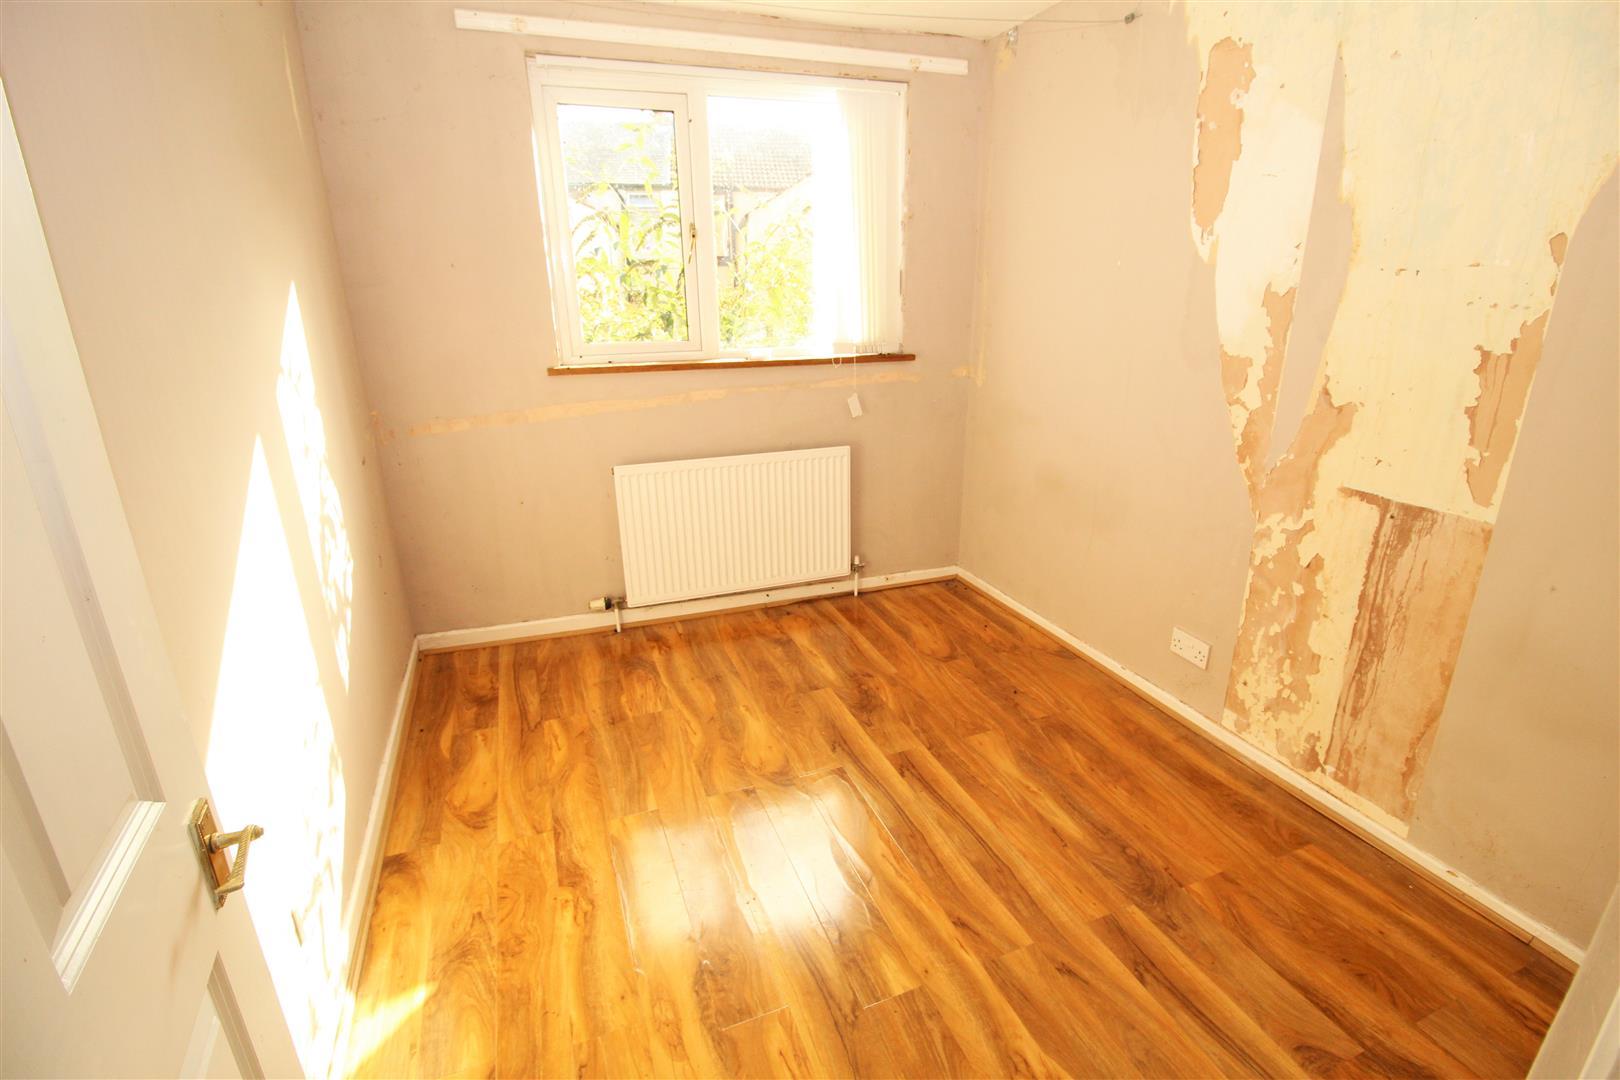 5 Bedrooms, House - End Terrace, Marsh Lane, Bootle